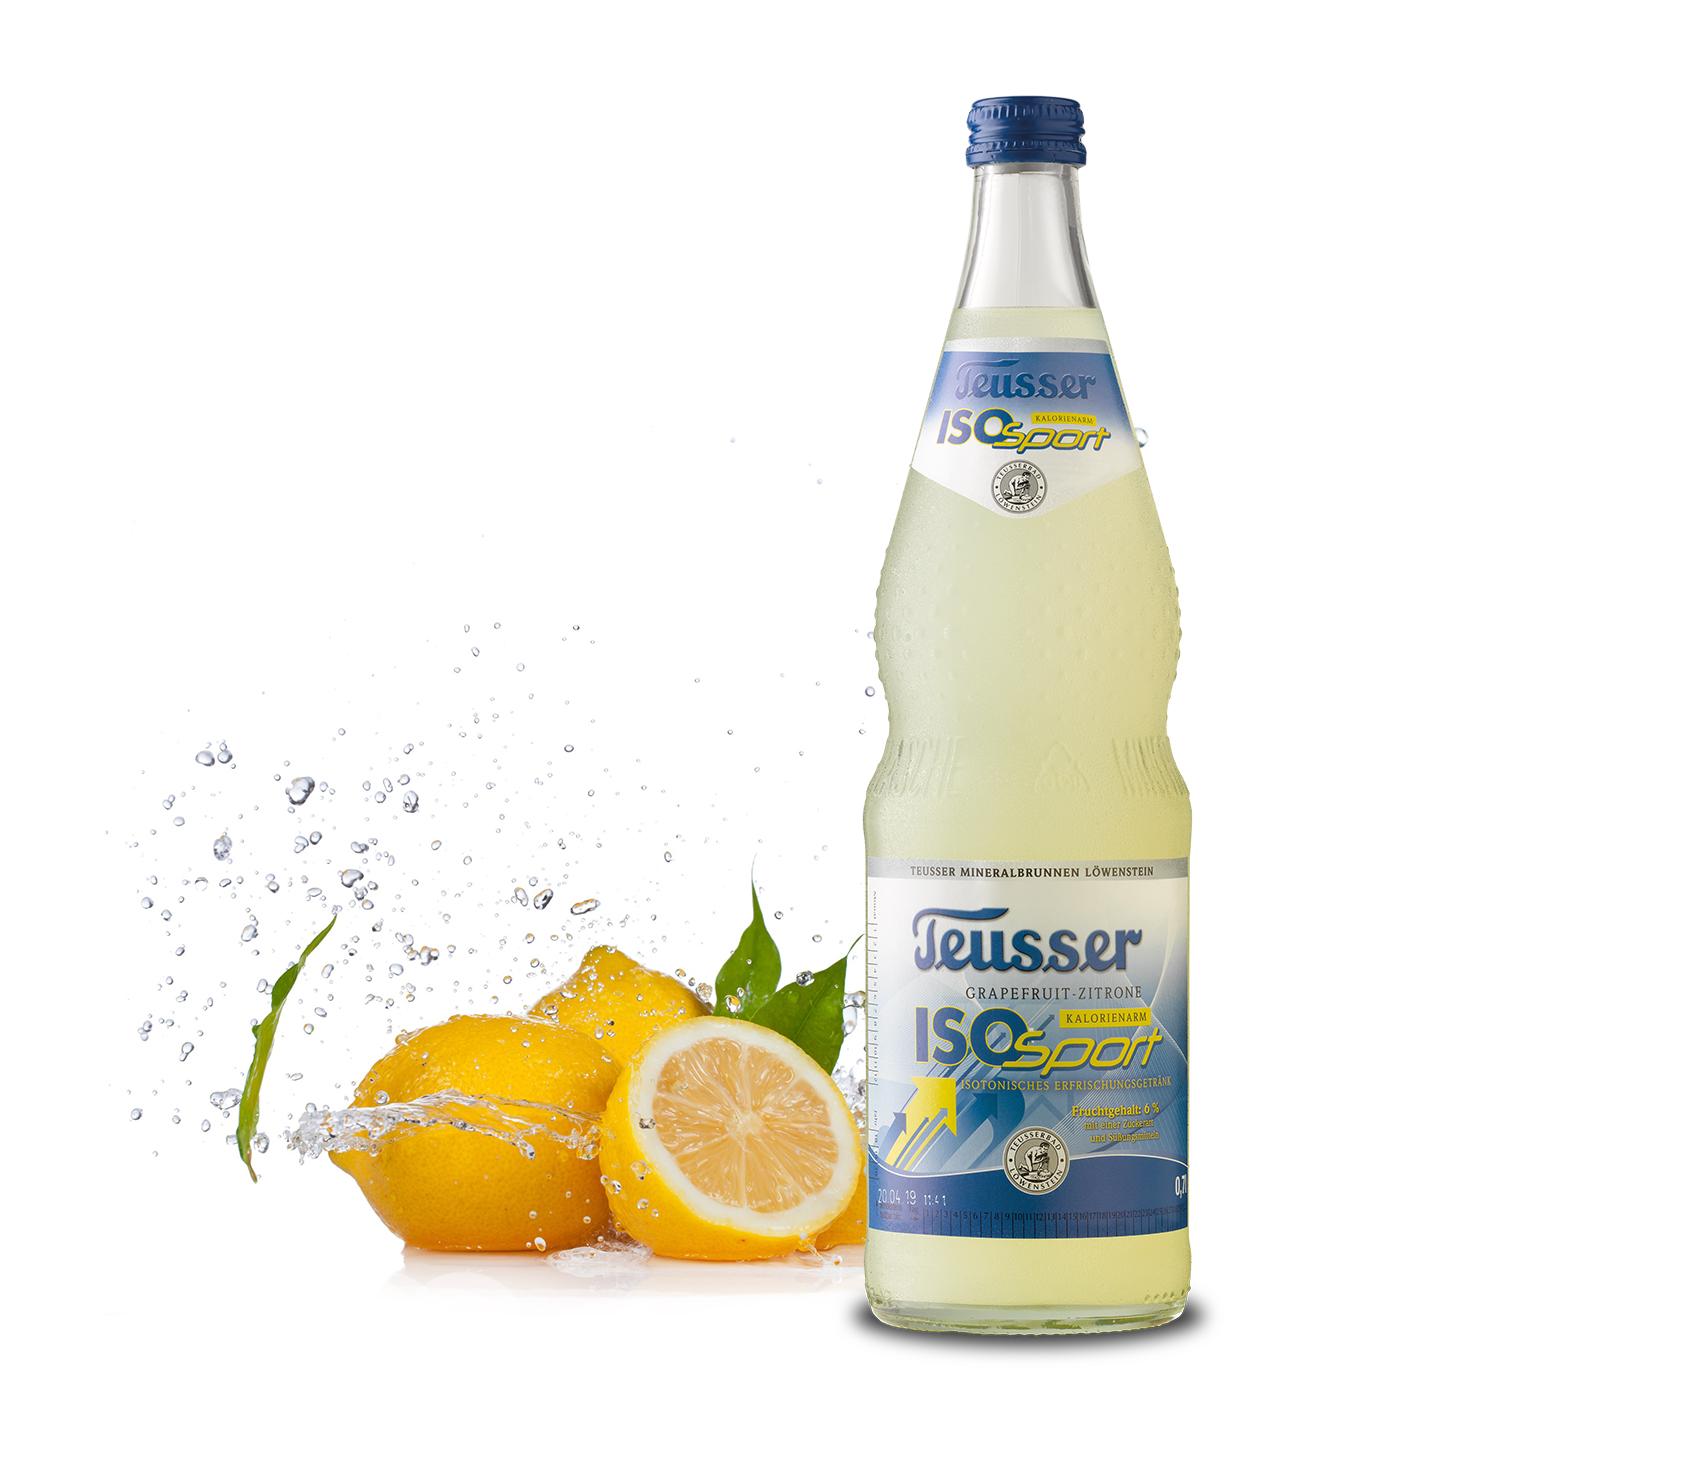 ISO Sport Grapefruit-Zitrone